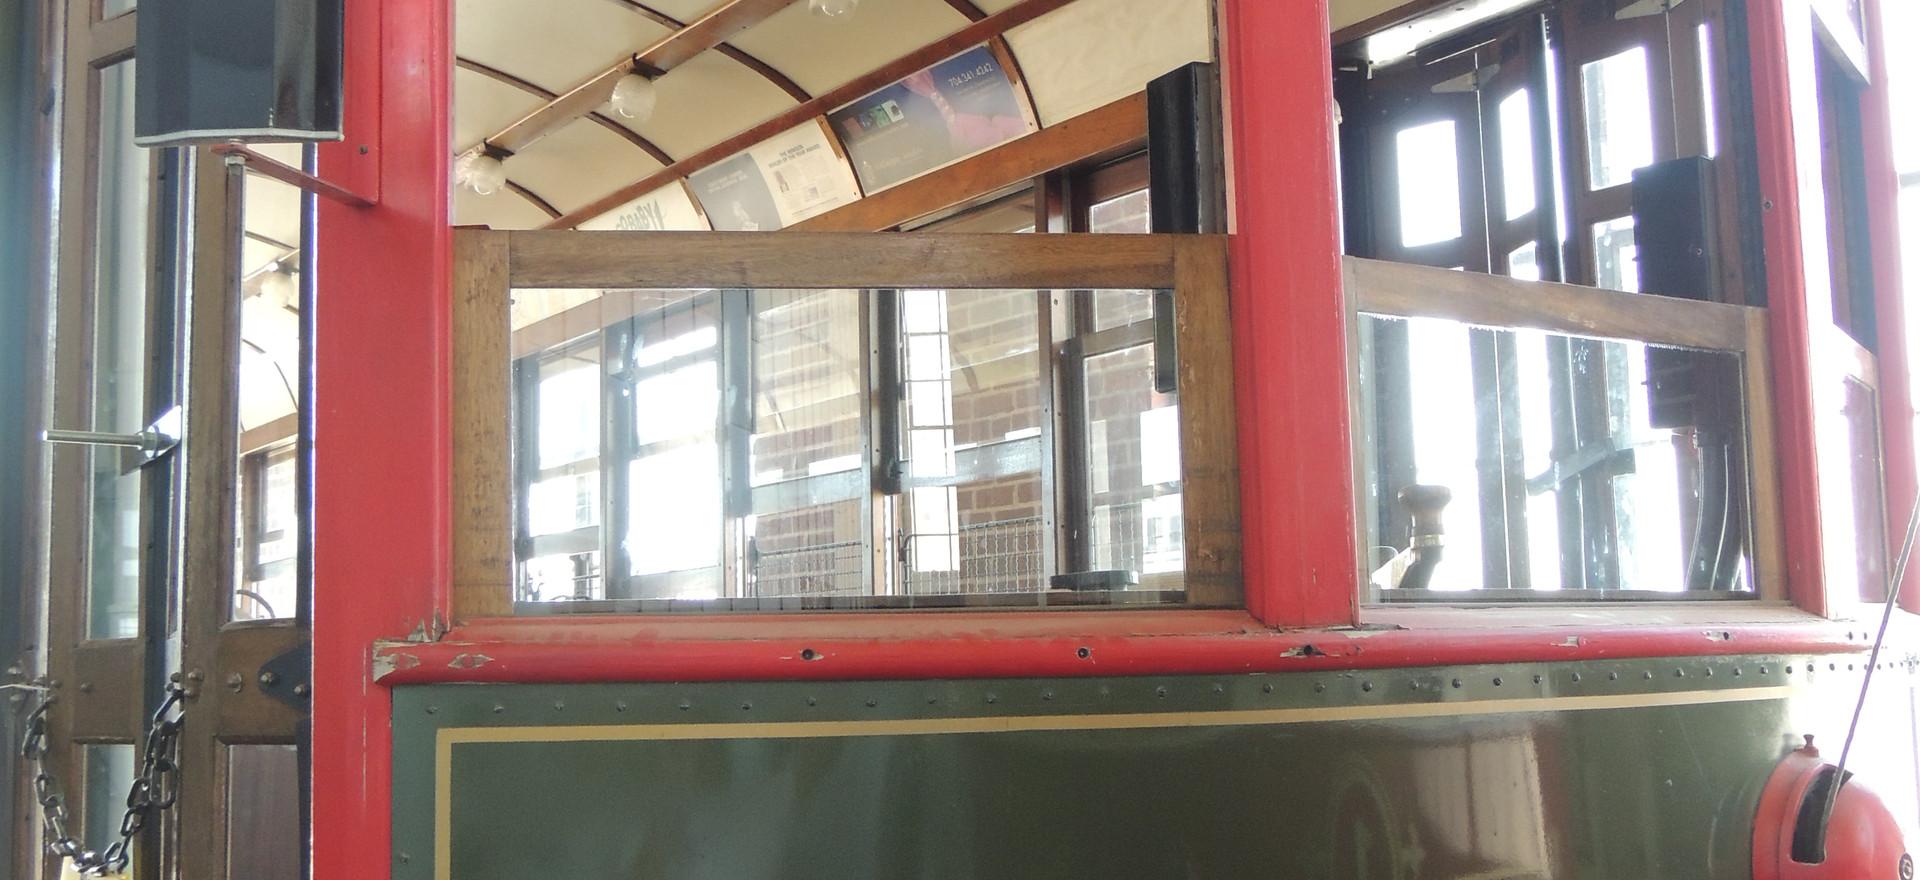 Rear view of Trolley Car #85